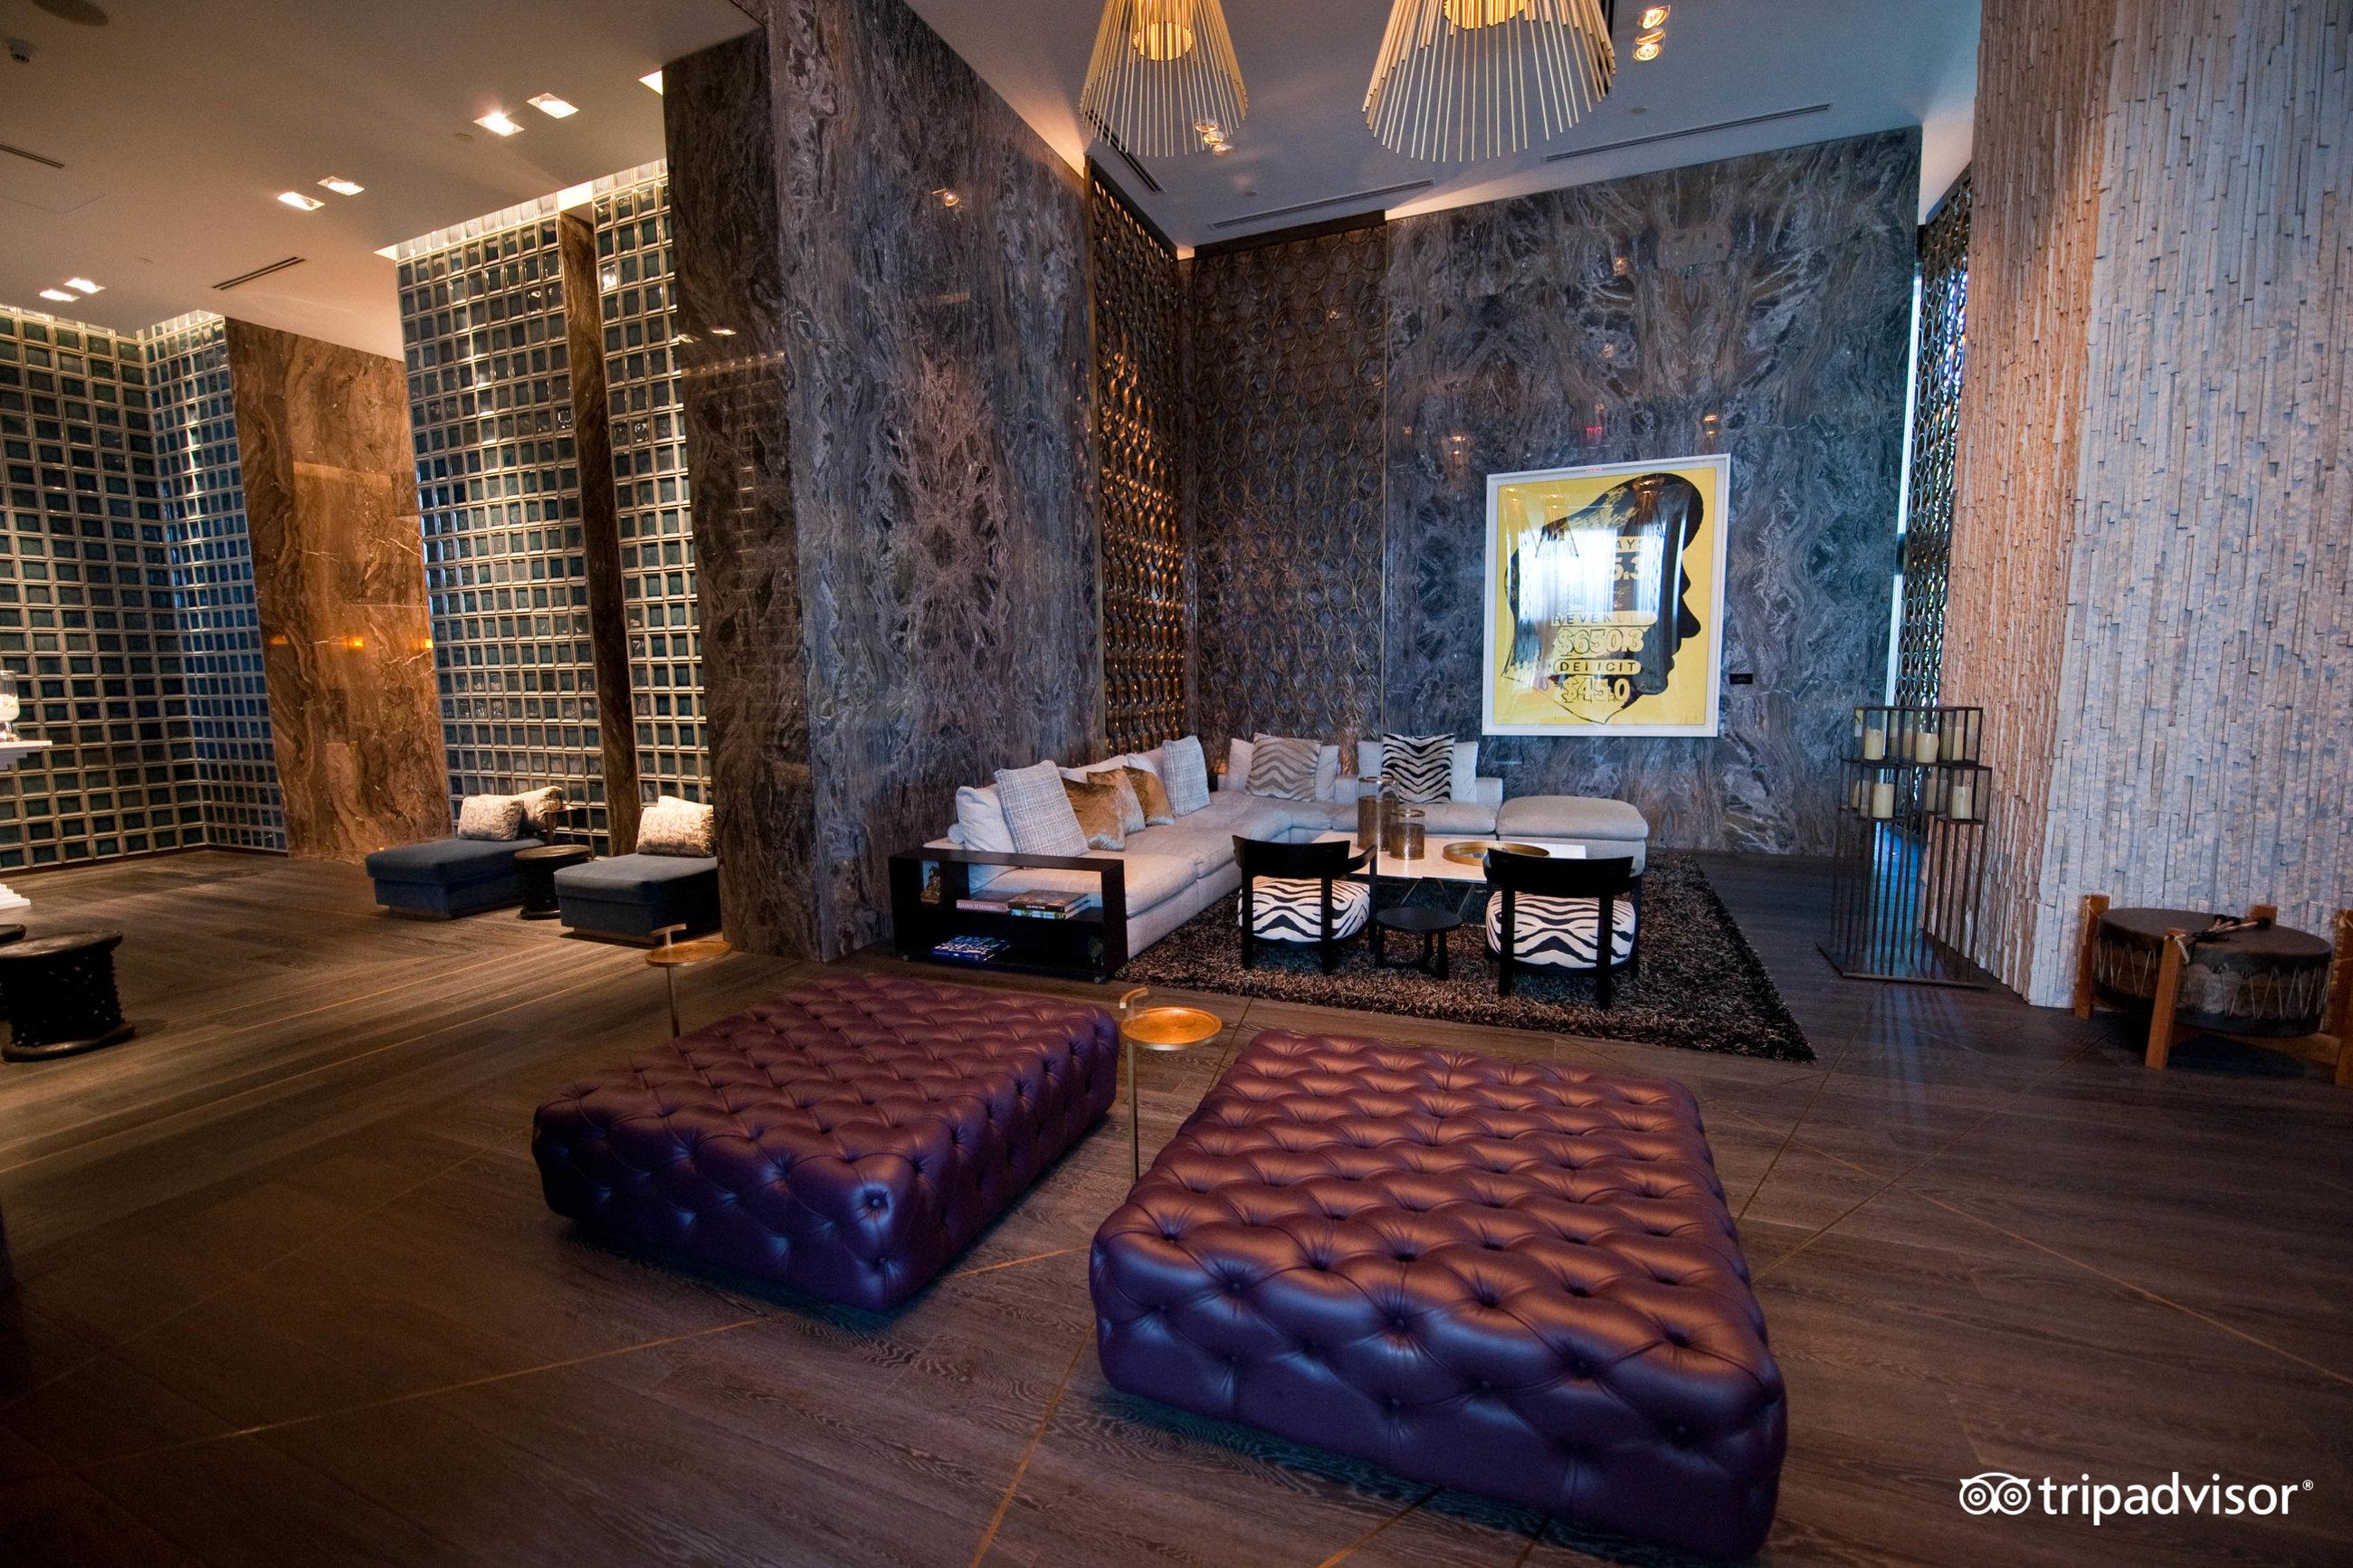 W south beach miami beach fl 2018 hotel review family for W living room miami